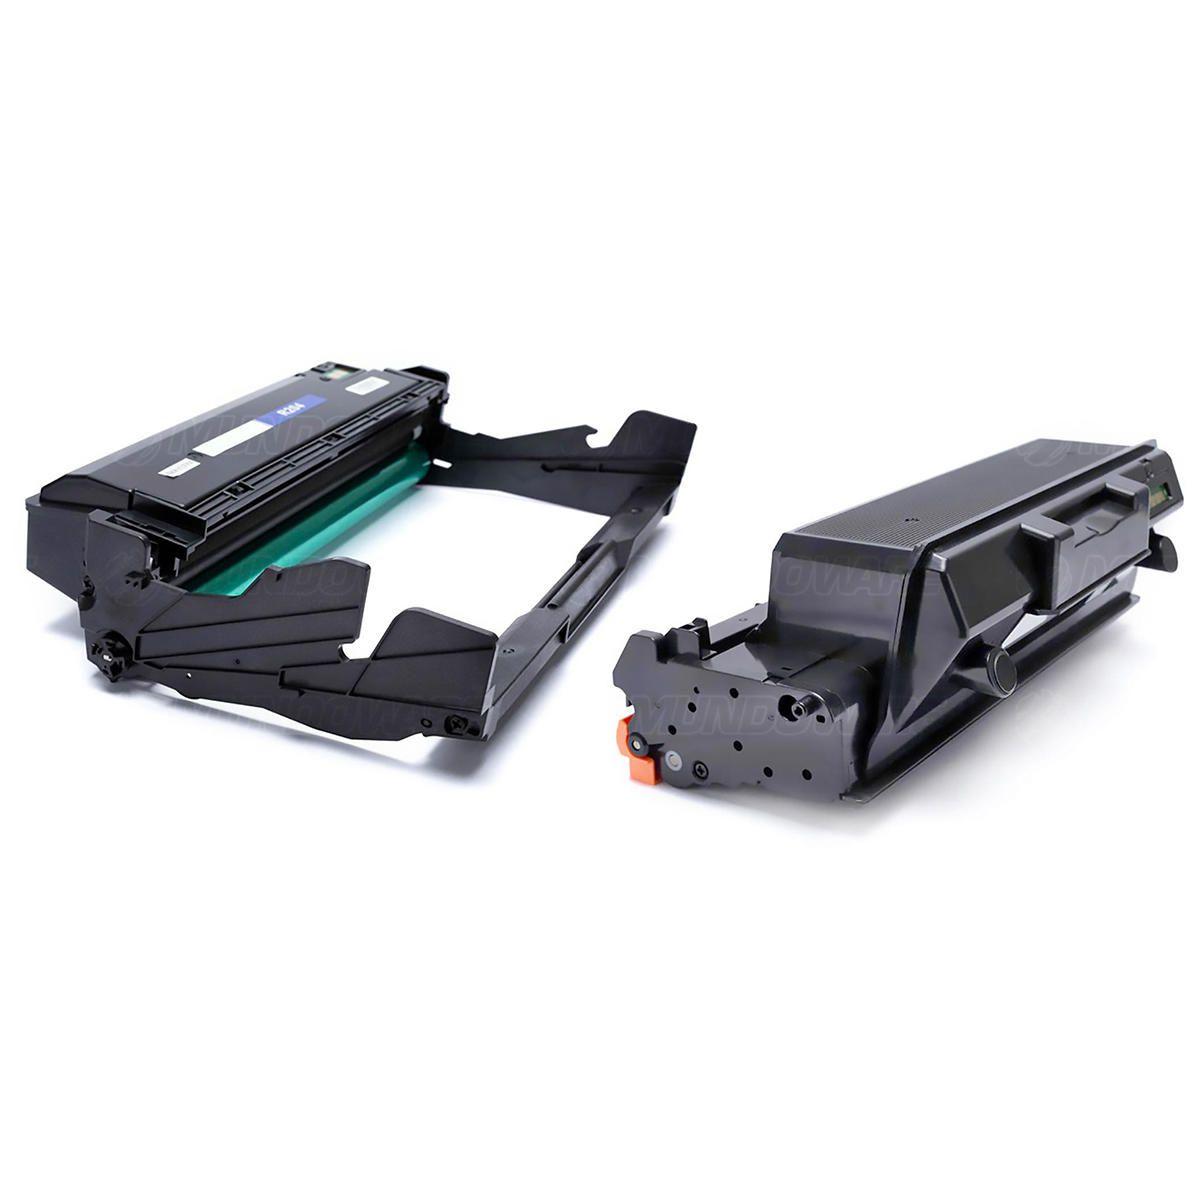 Compatível: Combo Fotocondutor R204 + Toner D204E para Samsung M3825 M3875 M4025 M4075 M3825dw M4025nd M3875fw M4075fw